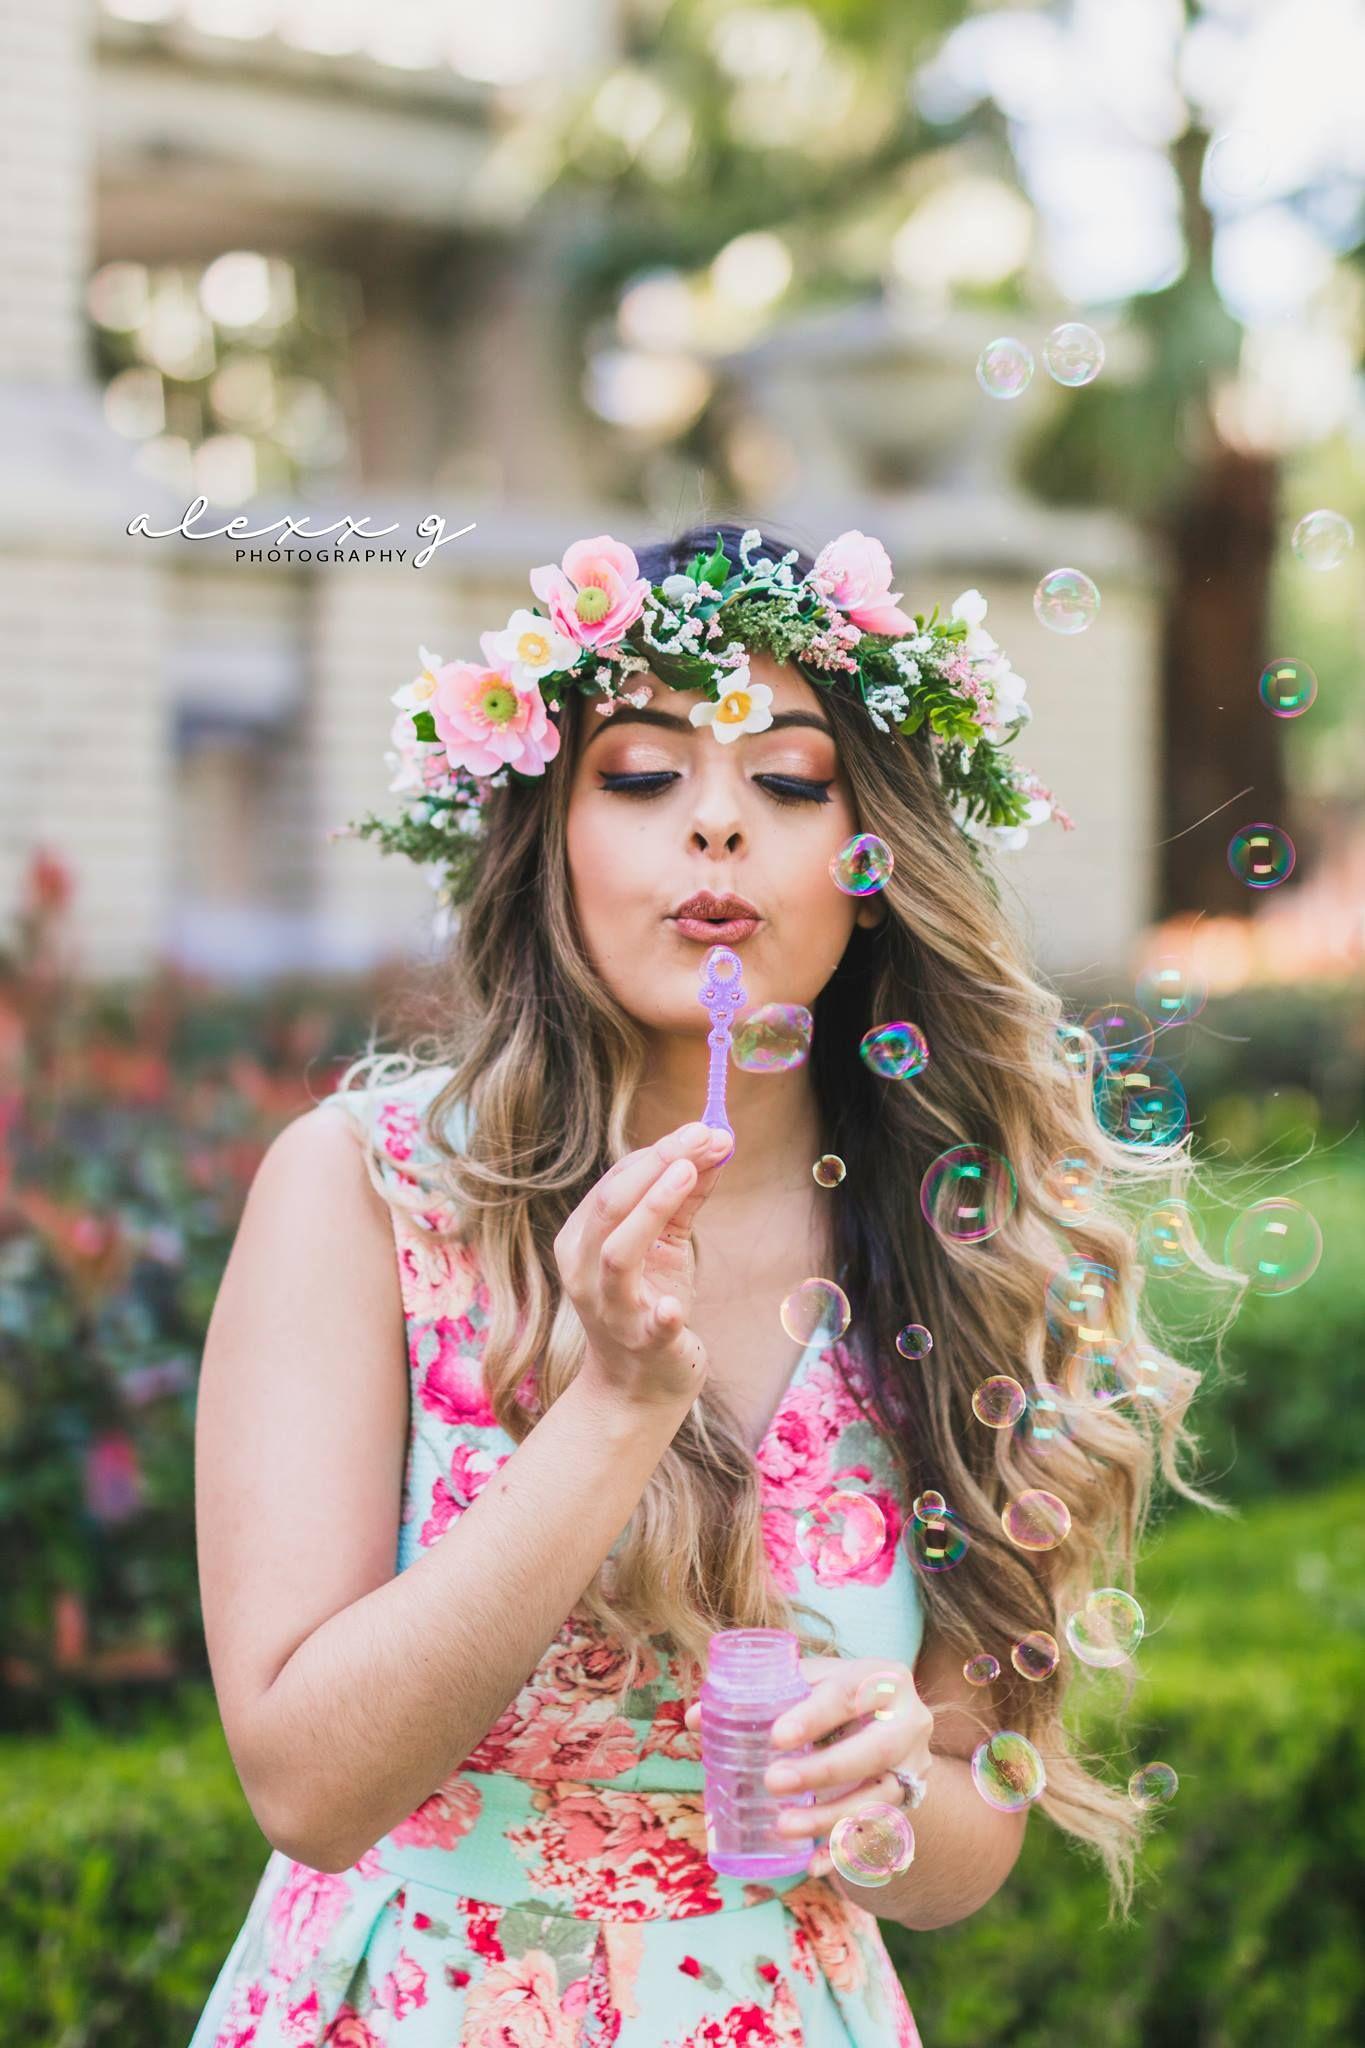 Confetti - Bubbles - Bubble Photoshoot - Flower crowns - DIY - Houston -Photography - Spring - RiceVillage - … | Flowers, Flower girl dresses, Birthdayphotoshoot